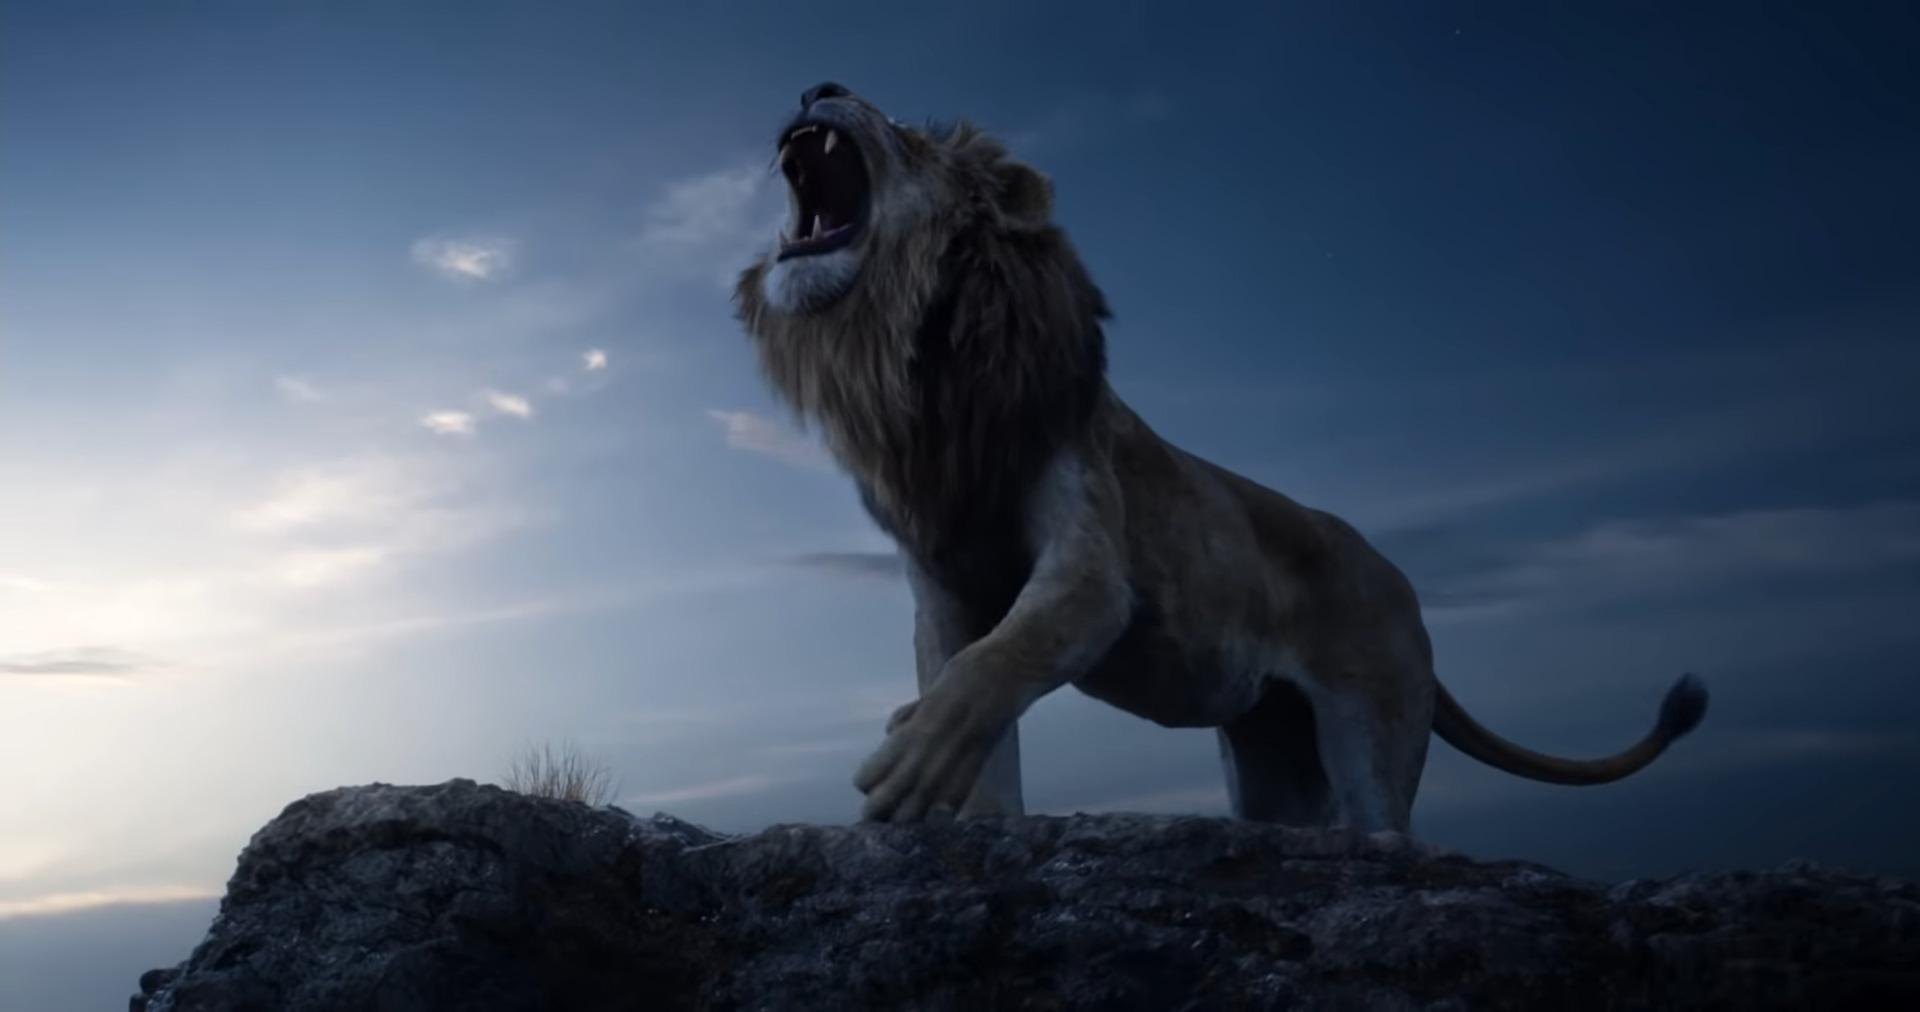 Congratulate, The lion king xxx words